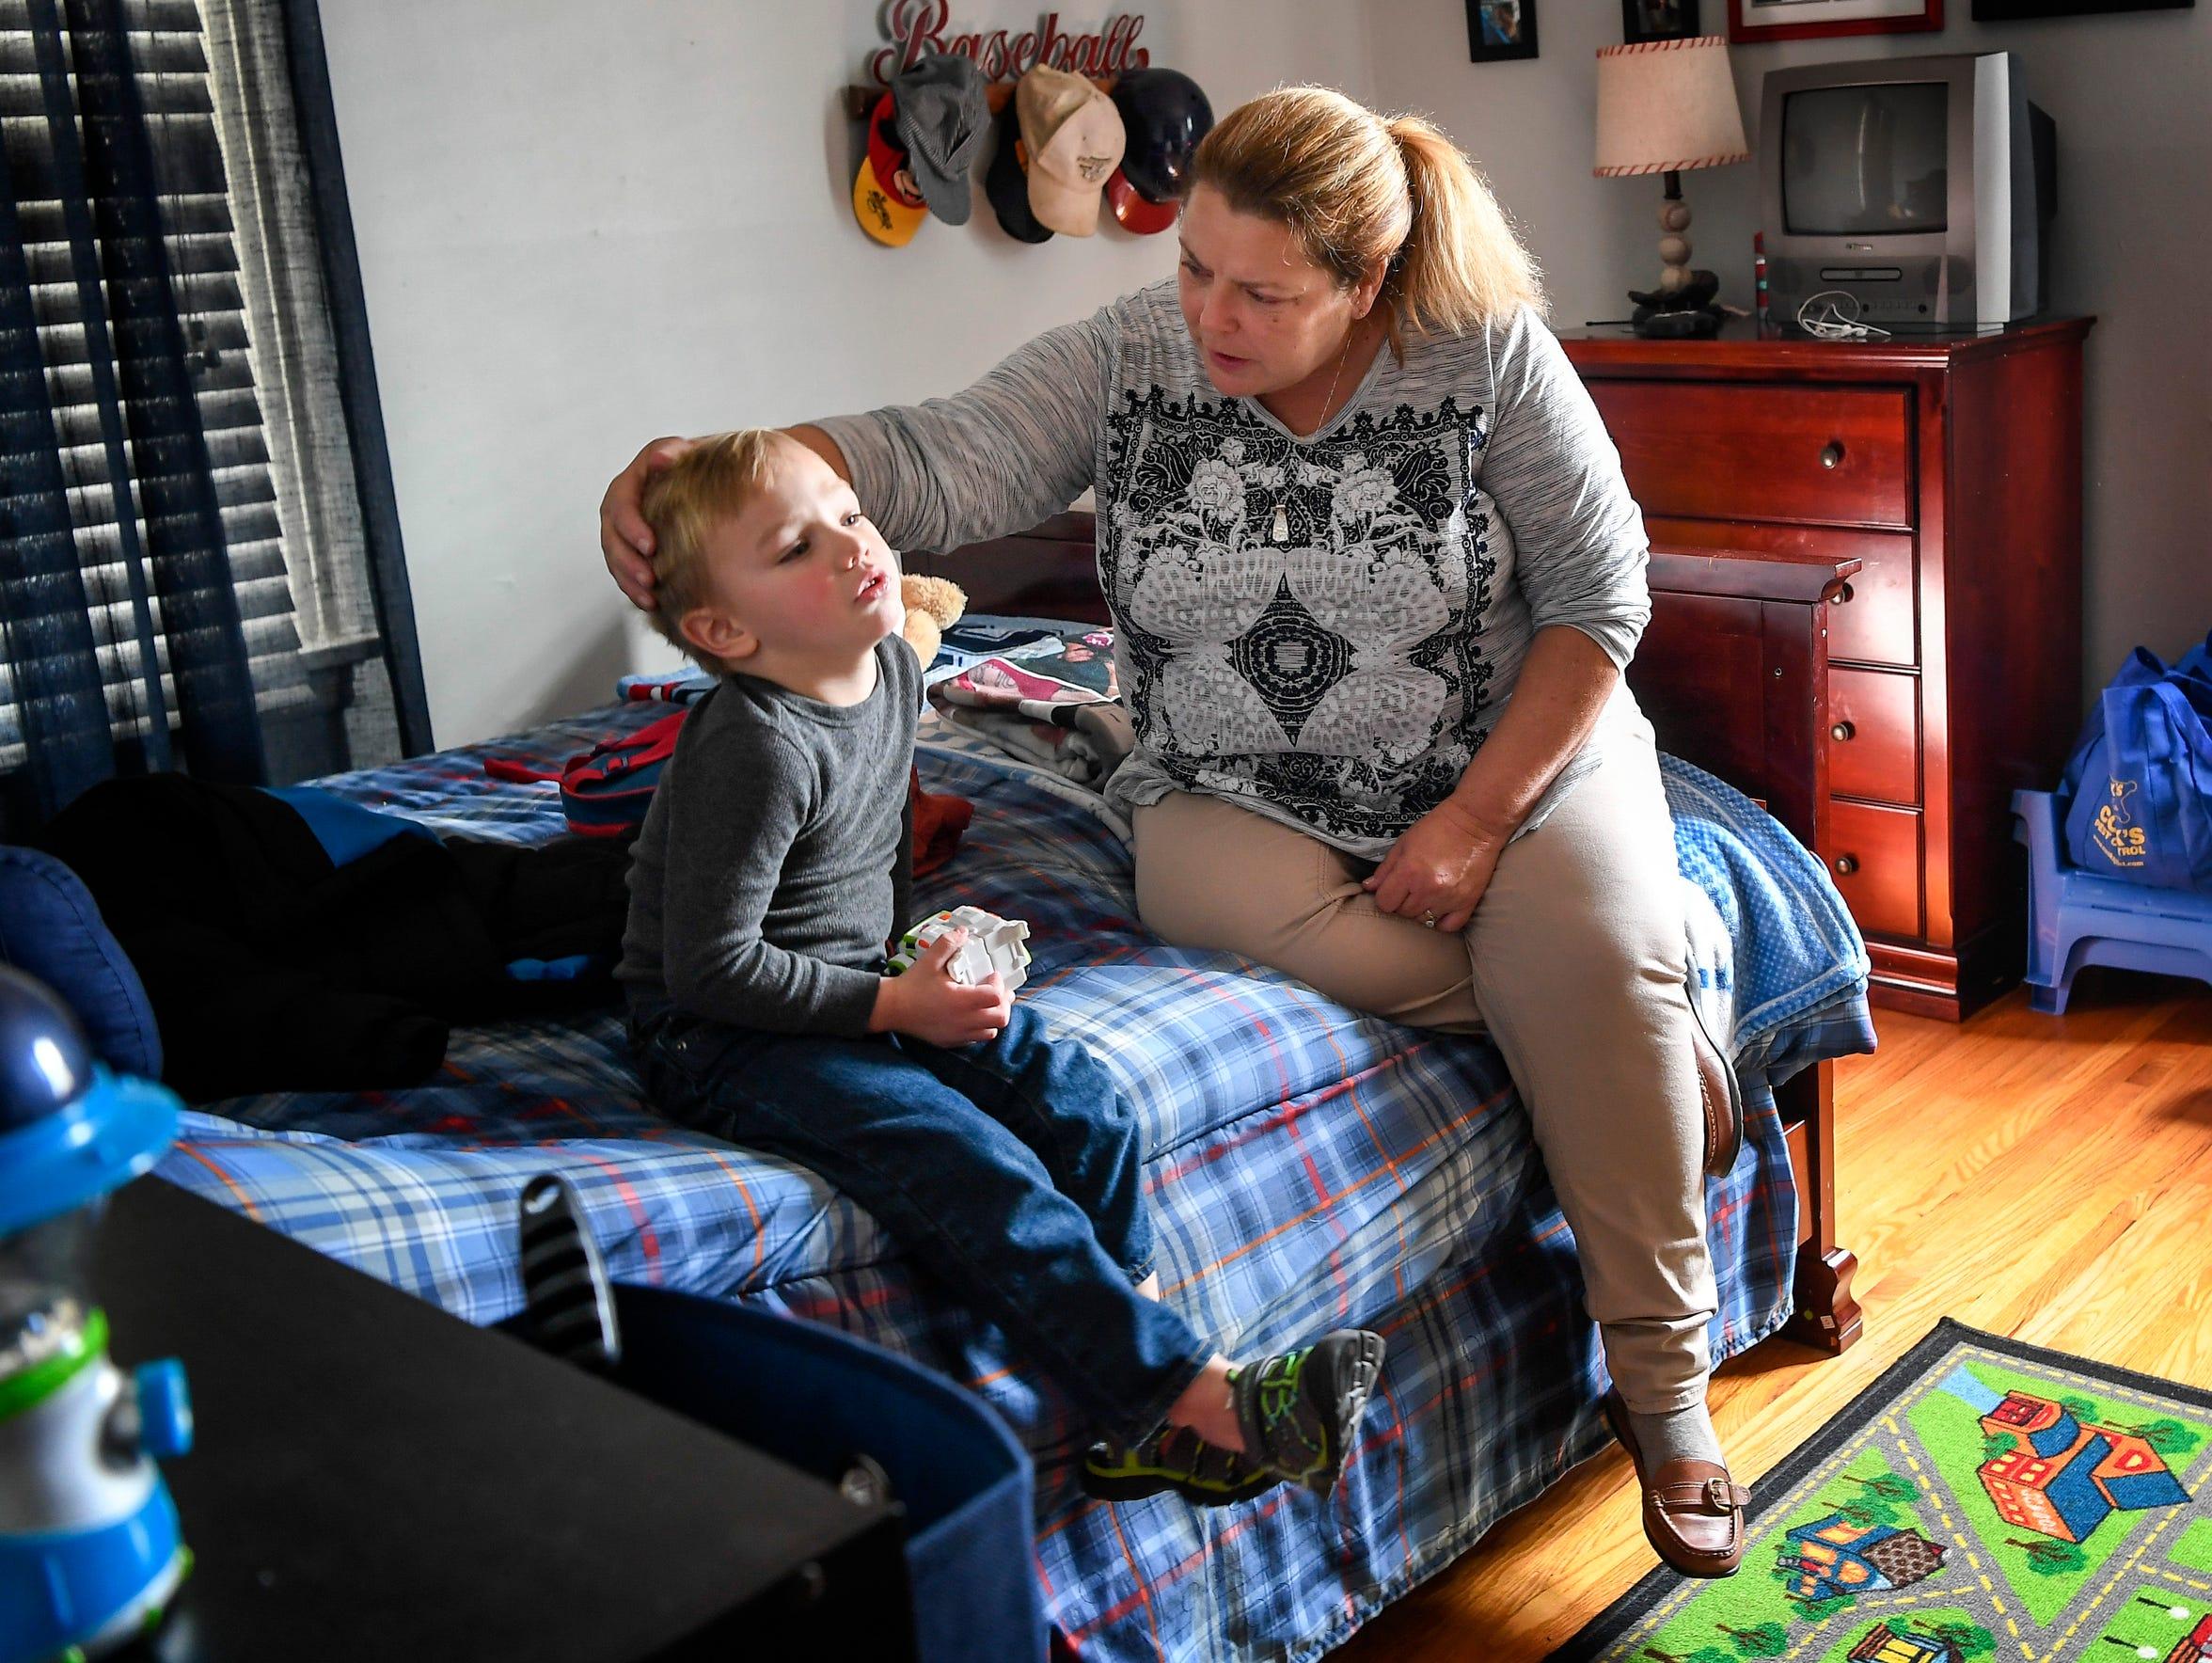 Tina Baltz tries to comfort her grandson, 4-year-old